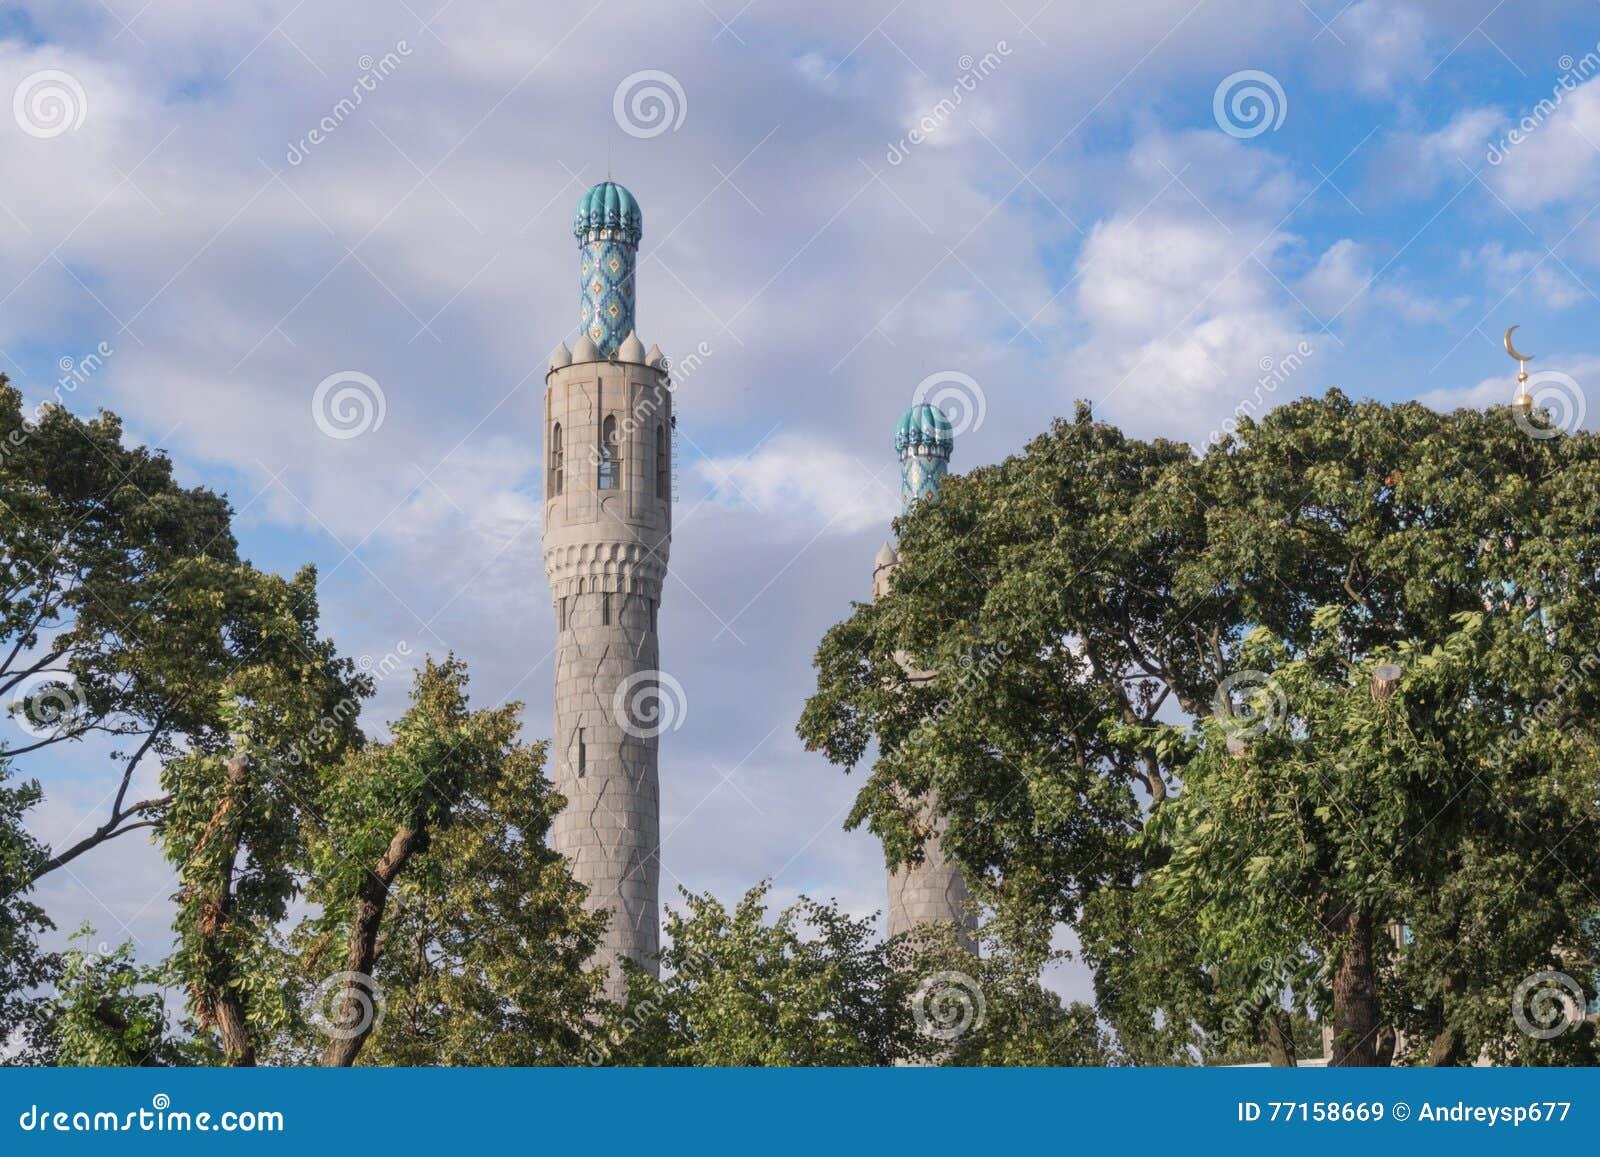 Les minarets de la mosquée parmi les arbres